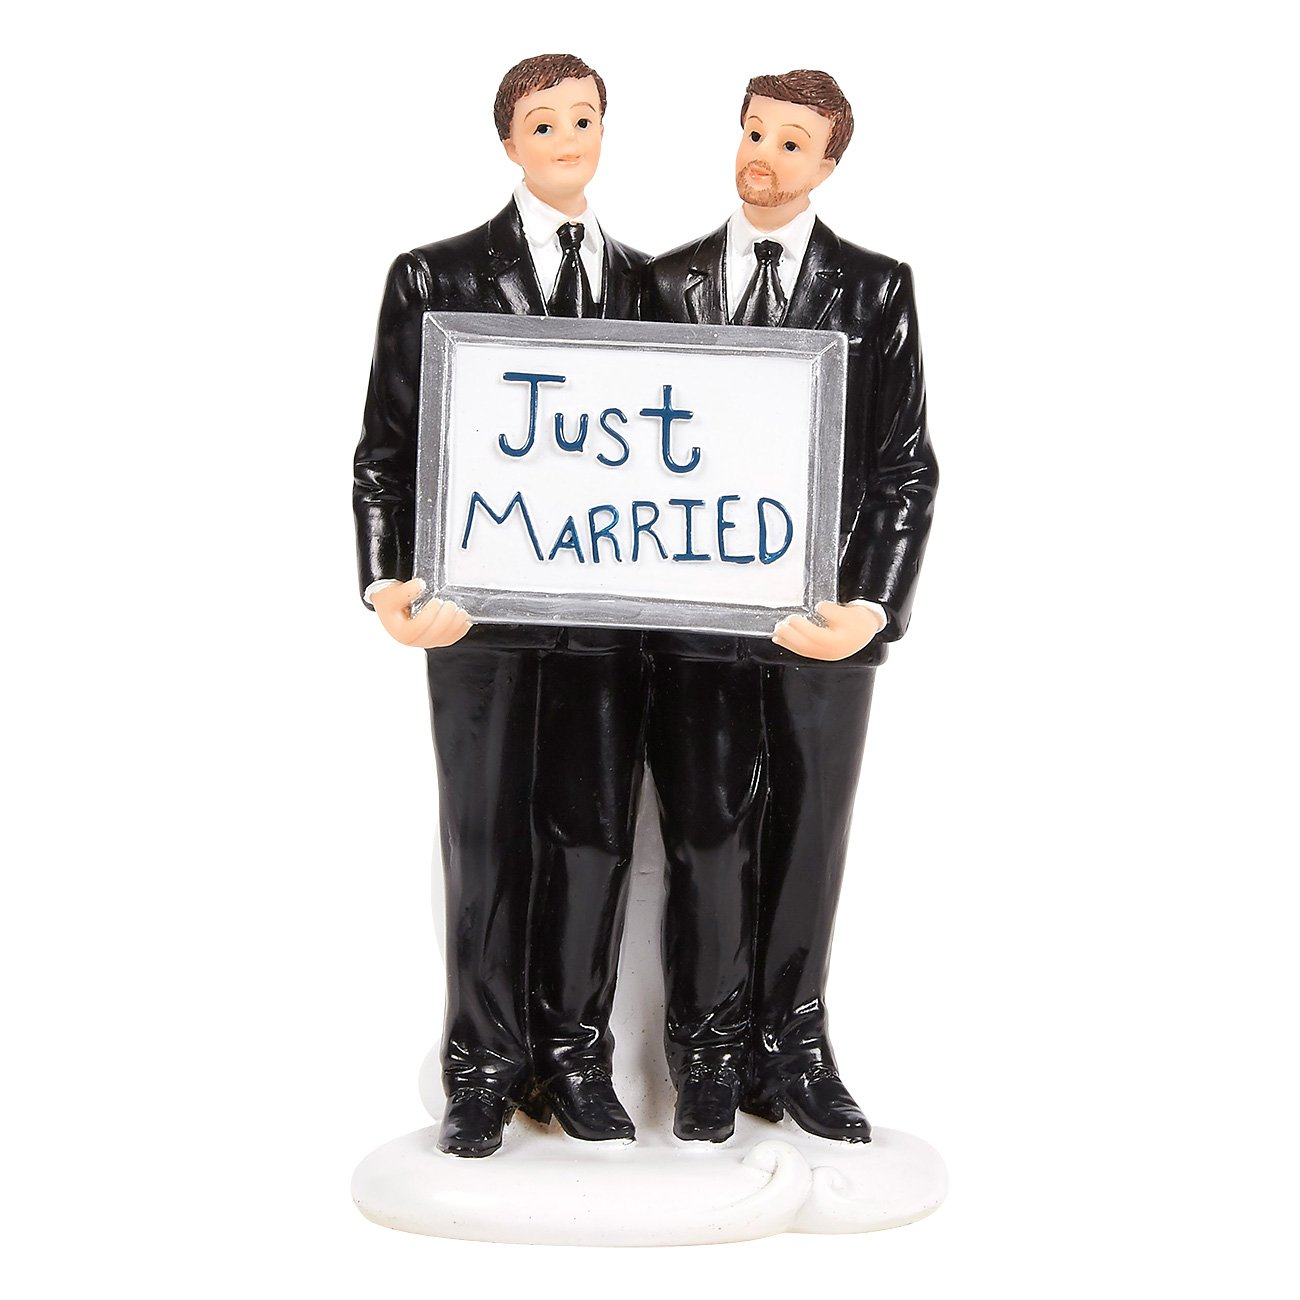 Cheap Cake Figurines Wedding Find Cake Figurines Wedding Deals On